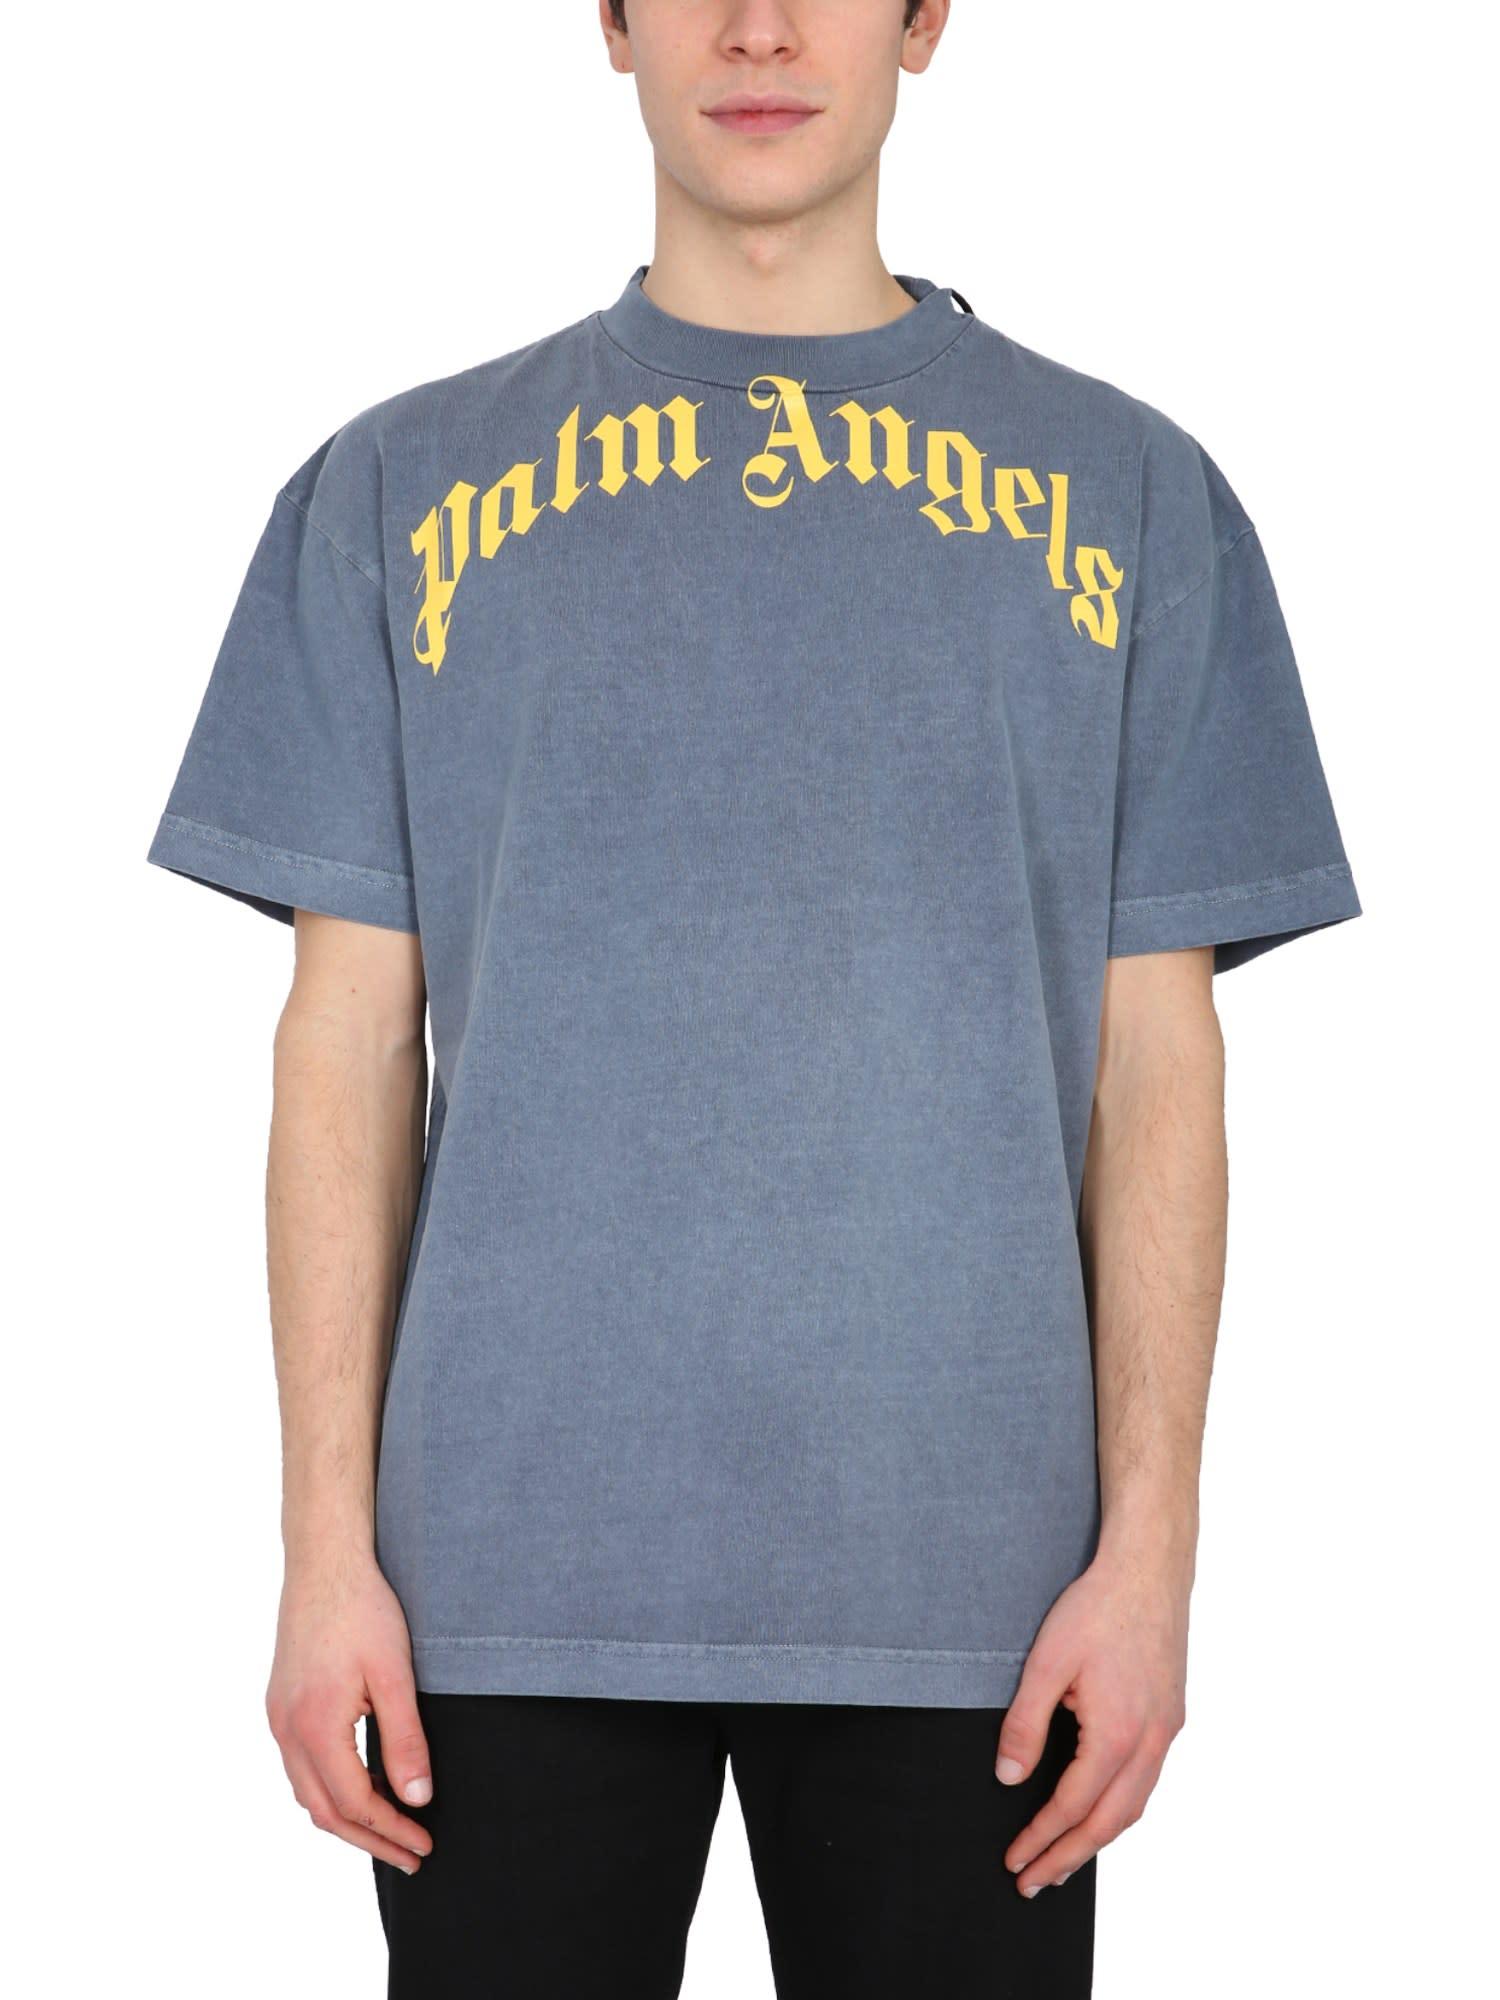 Palm Angels Crew Neck T-shirt